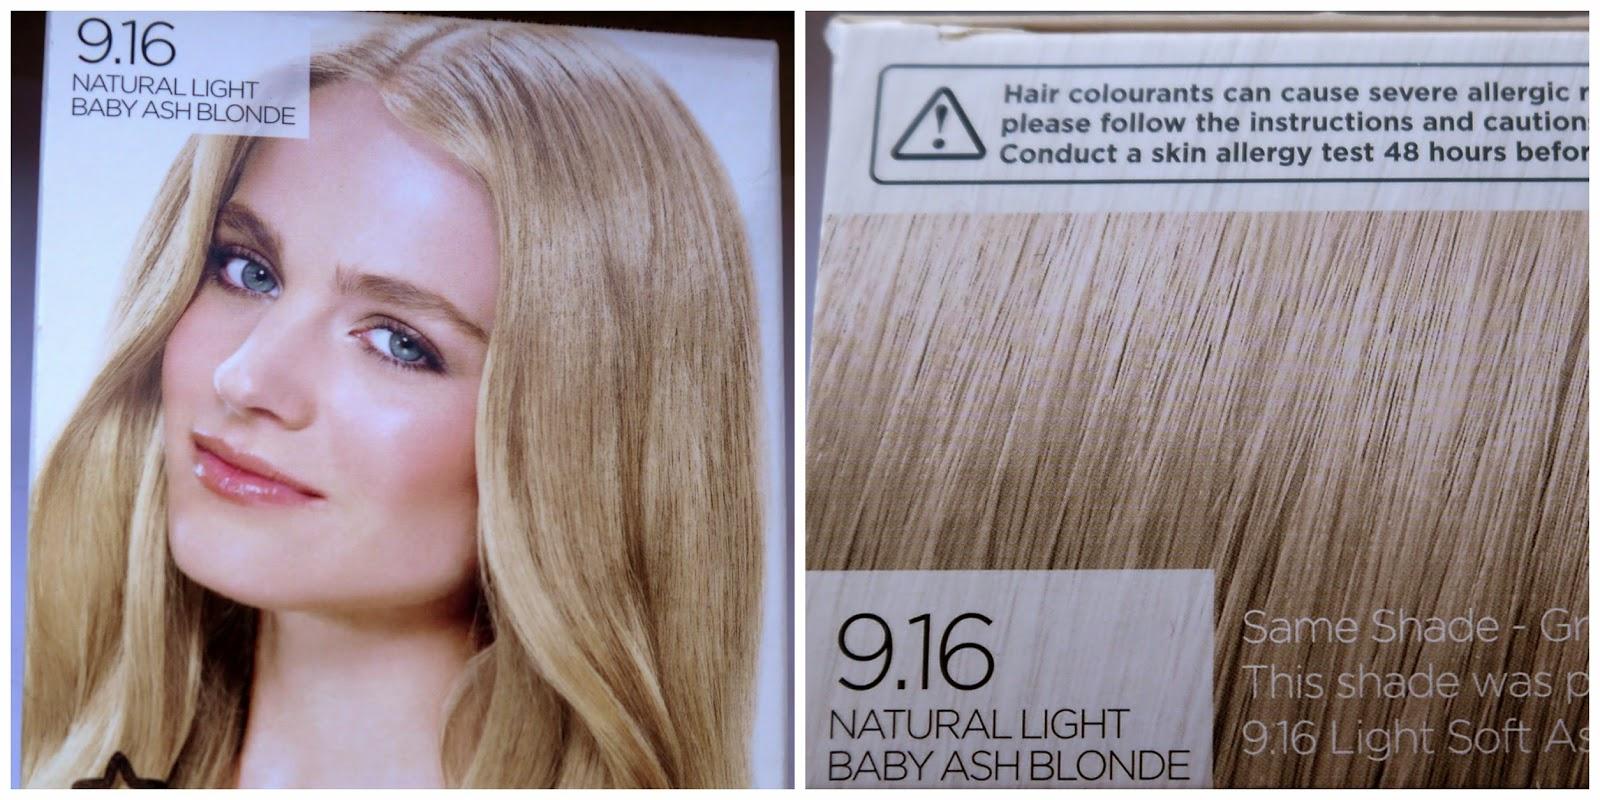 Chocolate brown hair dye superdrug trendy hairstyles in the usa chocolate brown hair dye superdrug pmusecretfo Choice Image